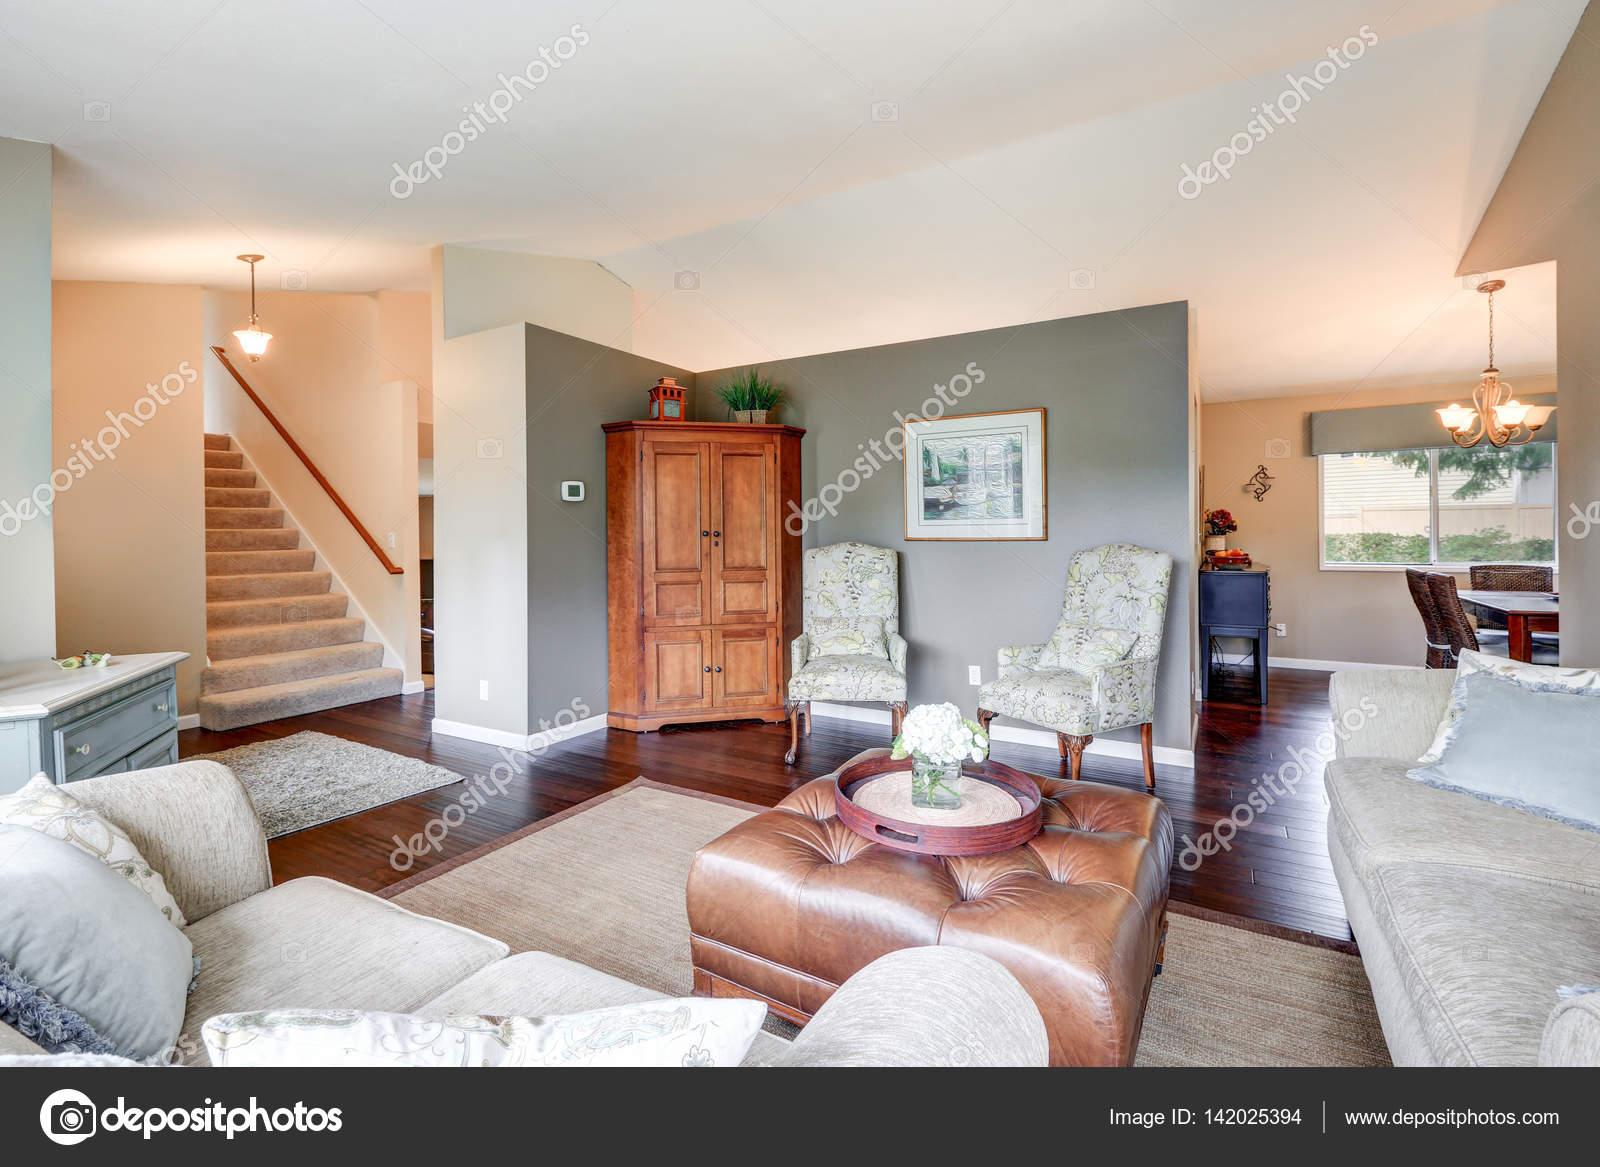 Gezellige familie kamer interieur met traditionele Amerikaanse ...